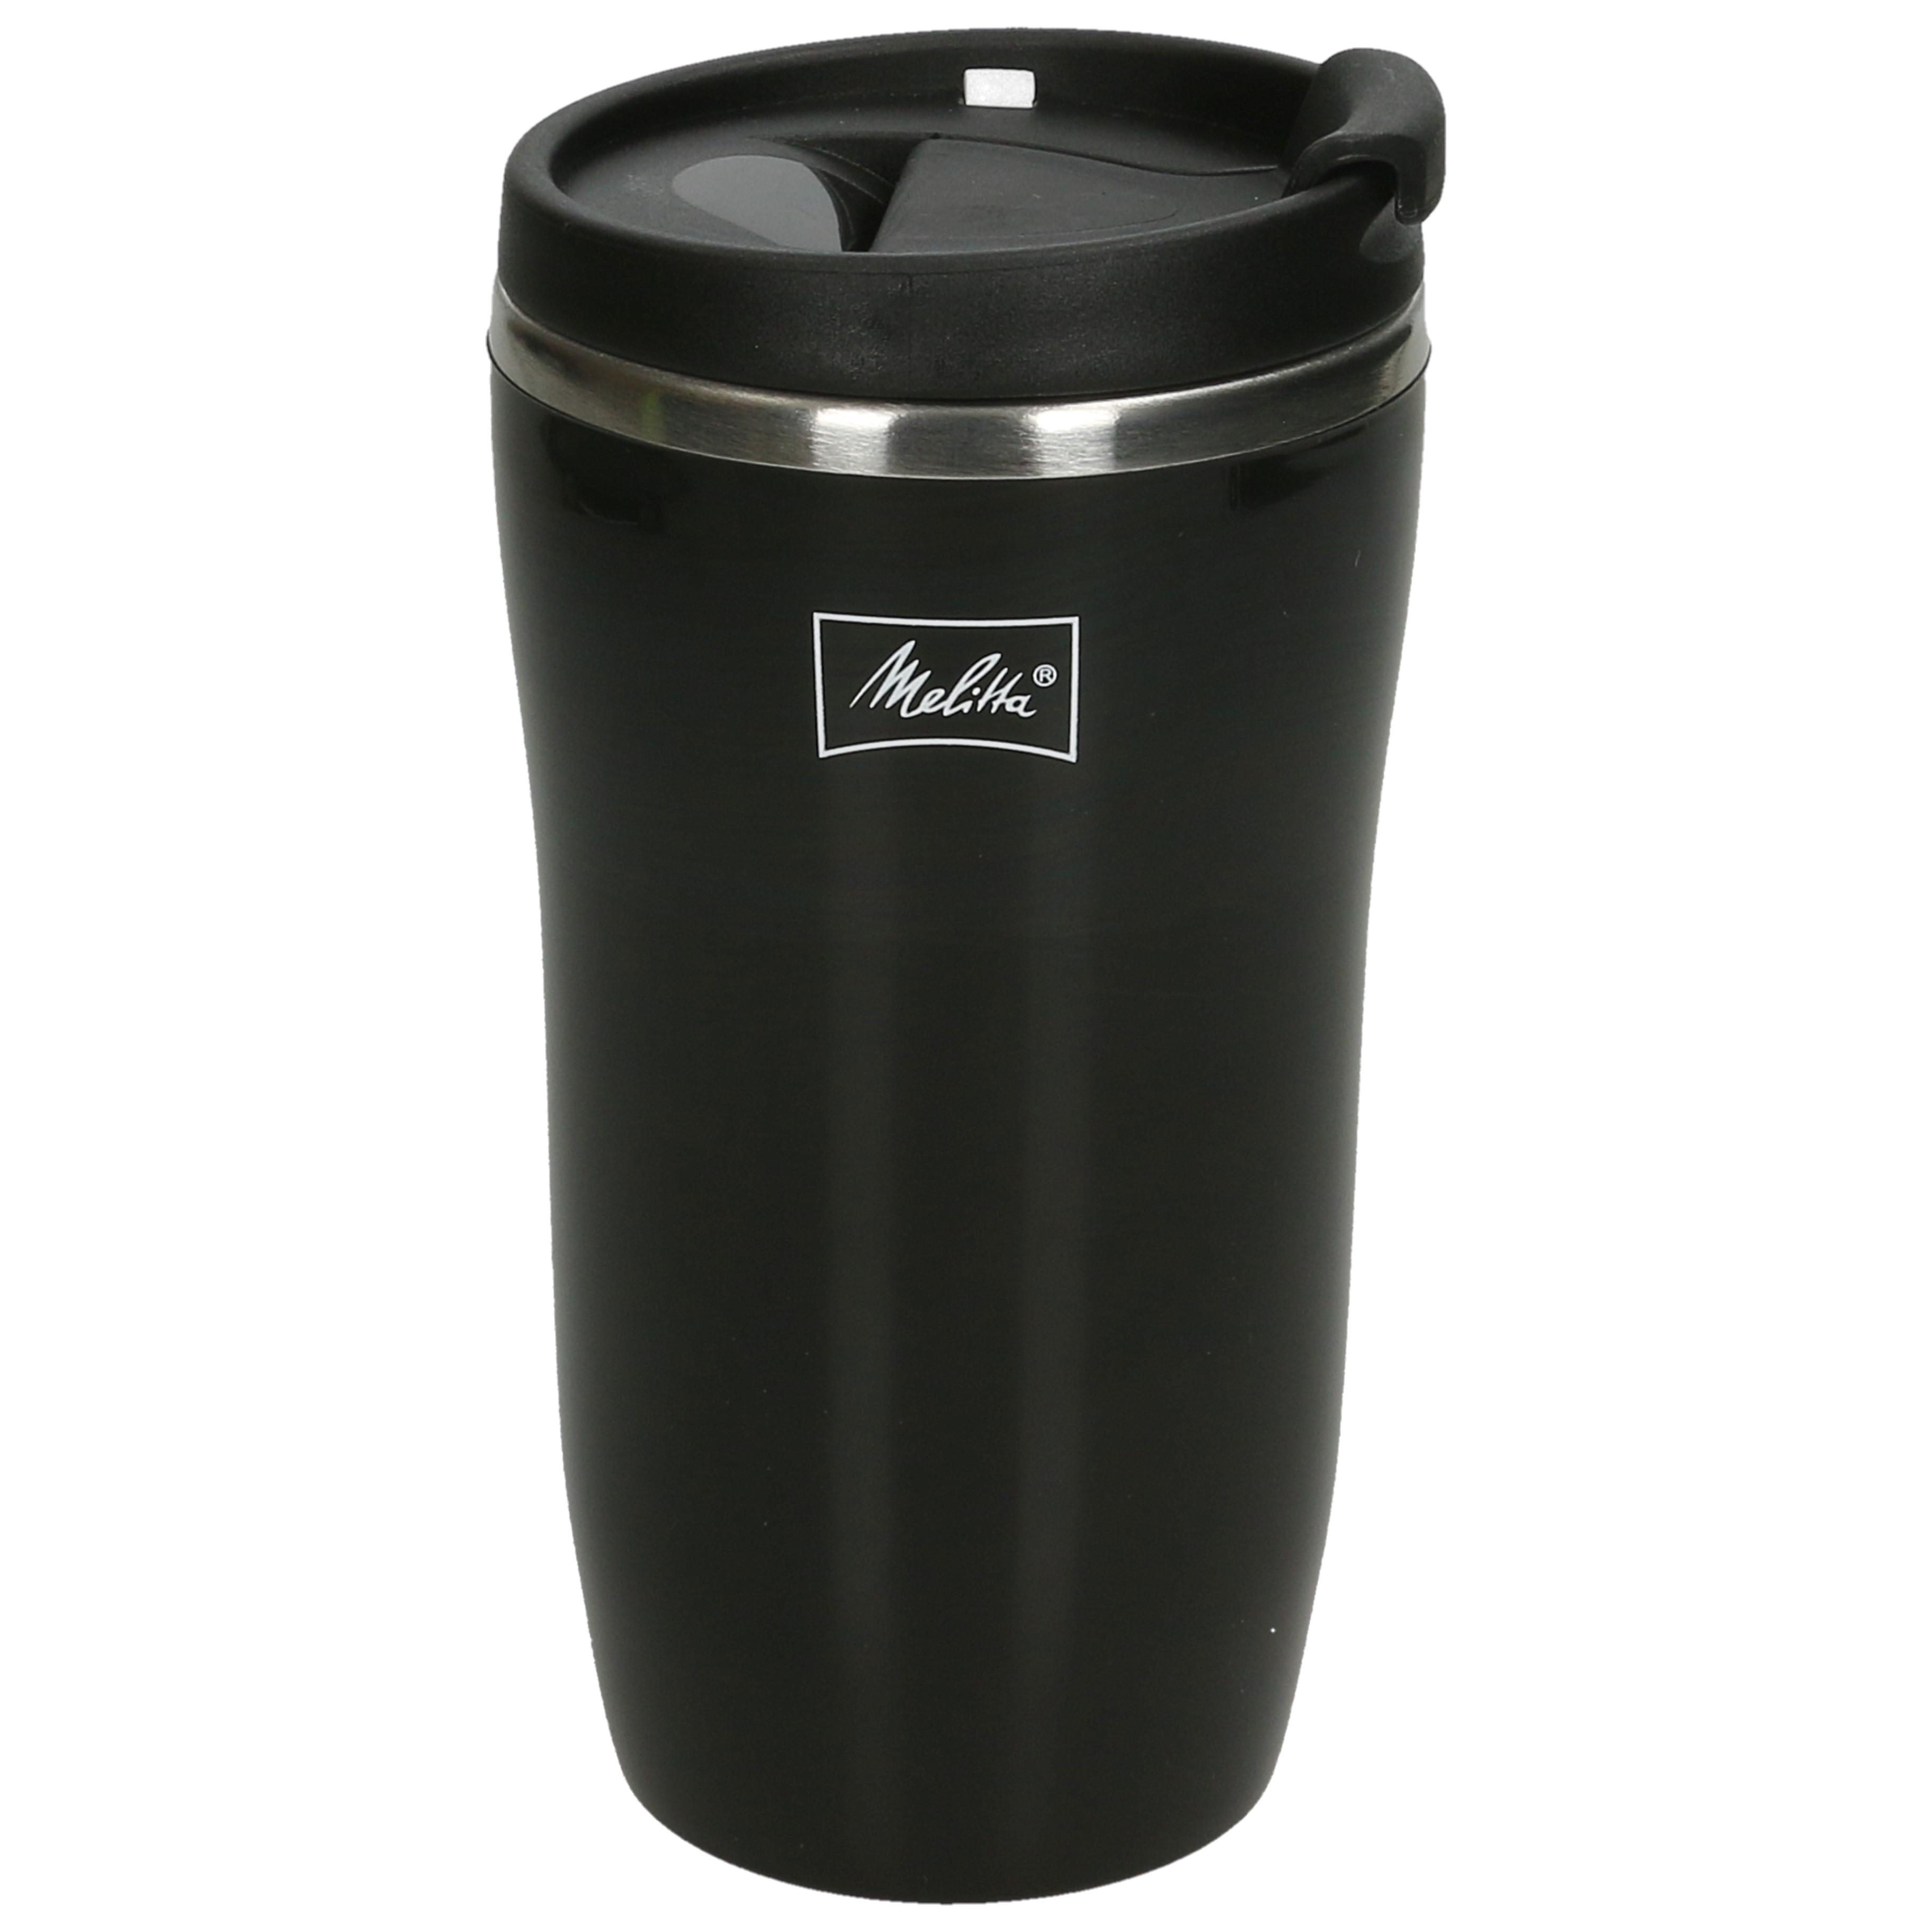 Details about Melitta 6758255 Thermal Coffee Travel Mug, Airtight Seal,  250ml, Black